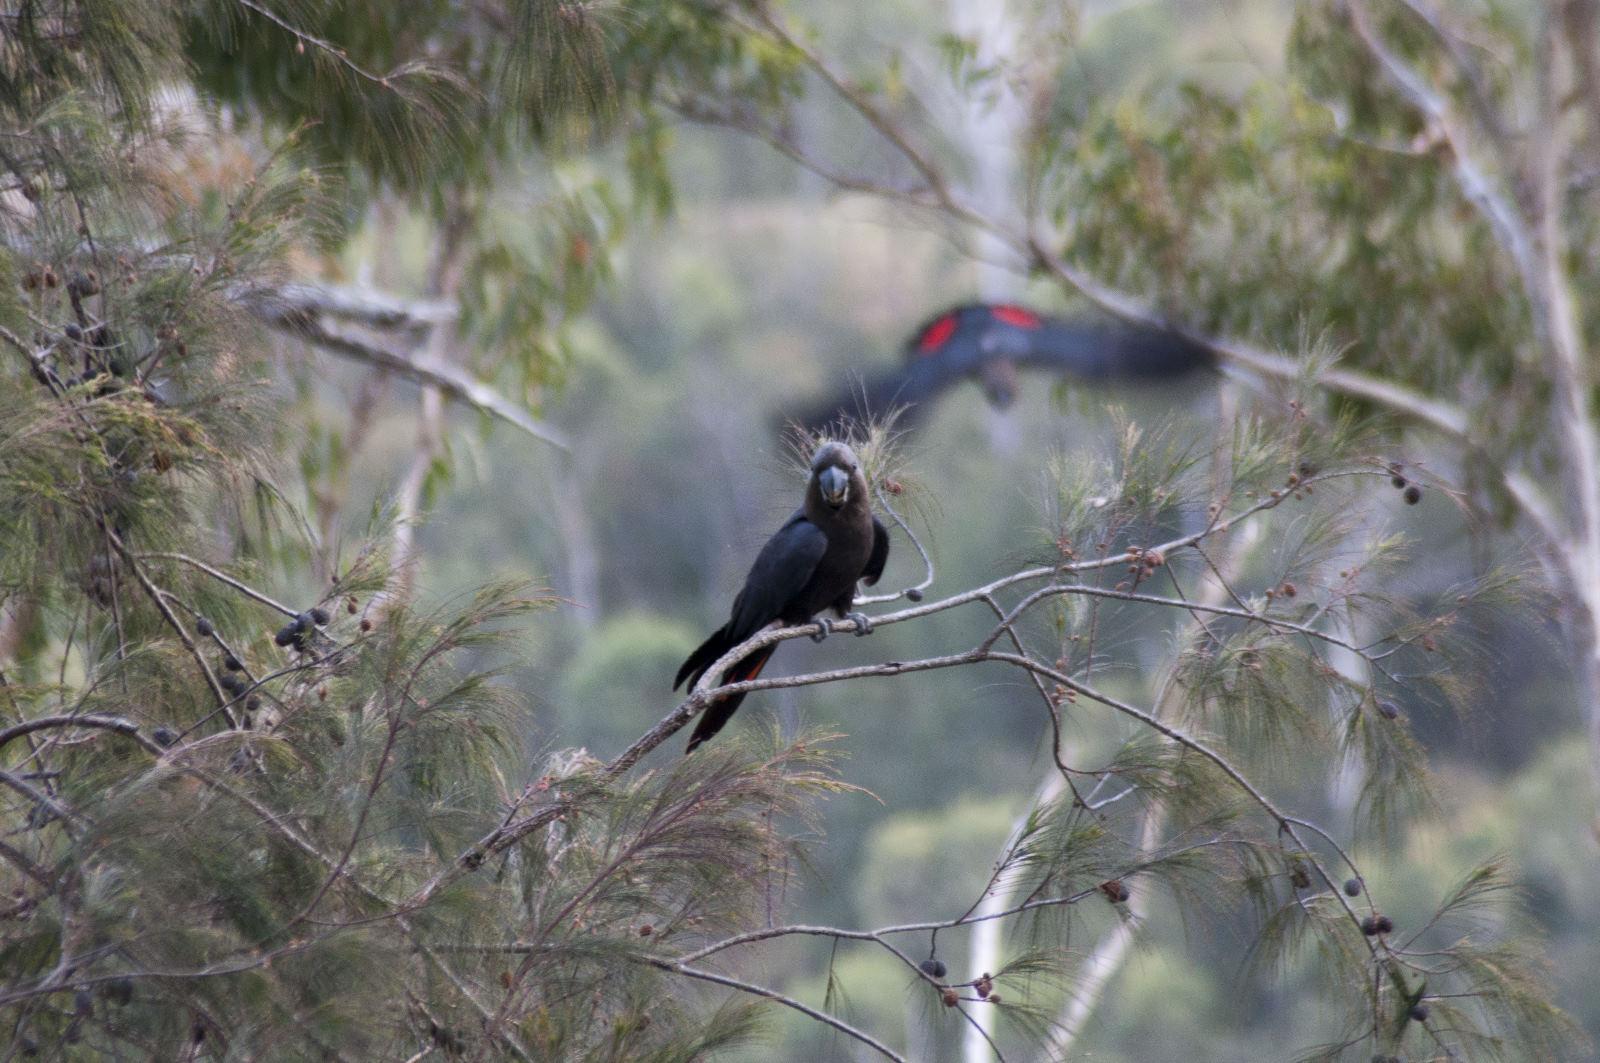 Glossy Black Cockatoo